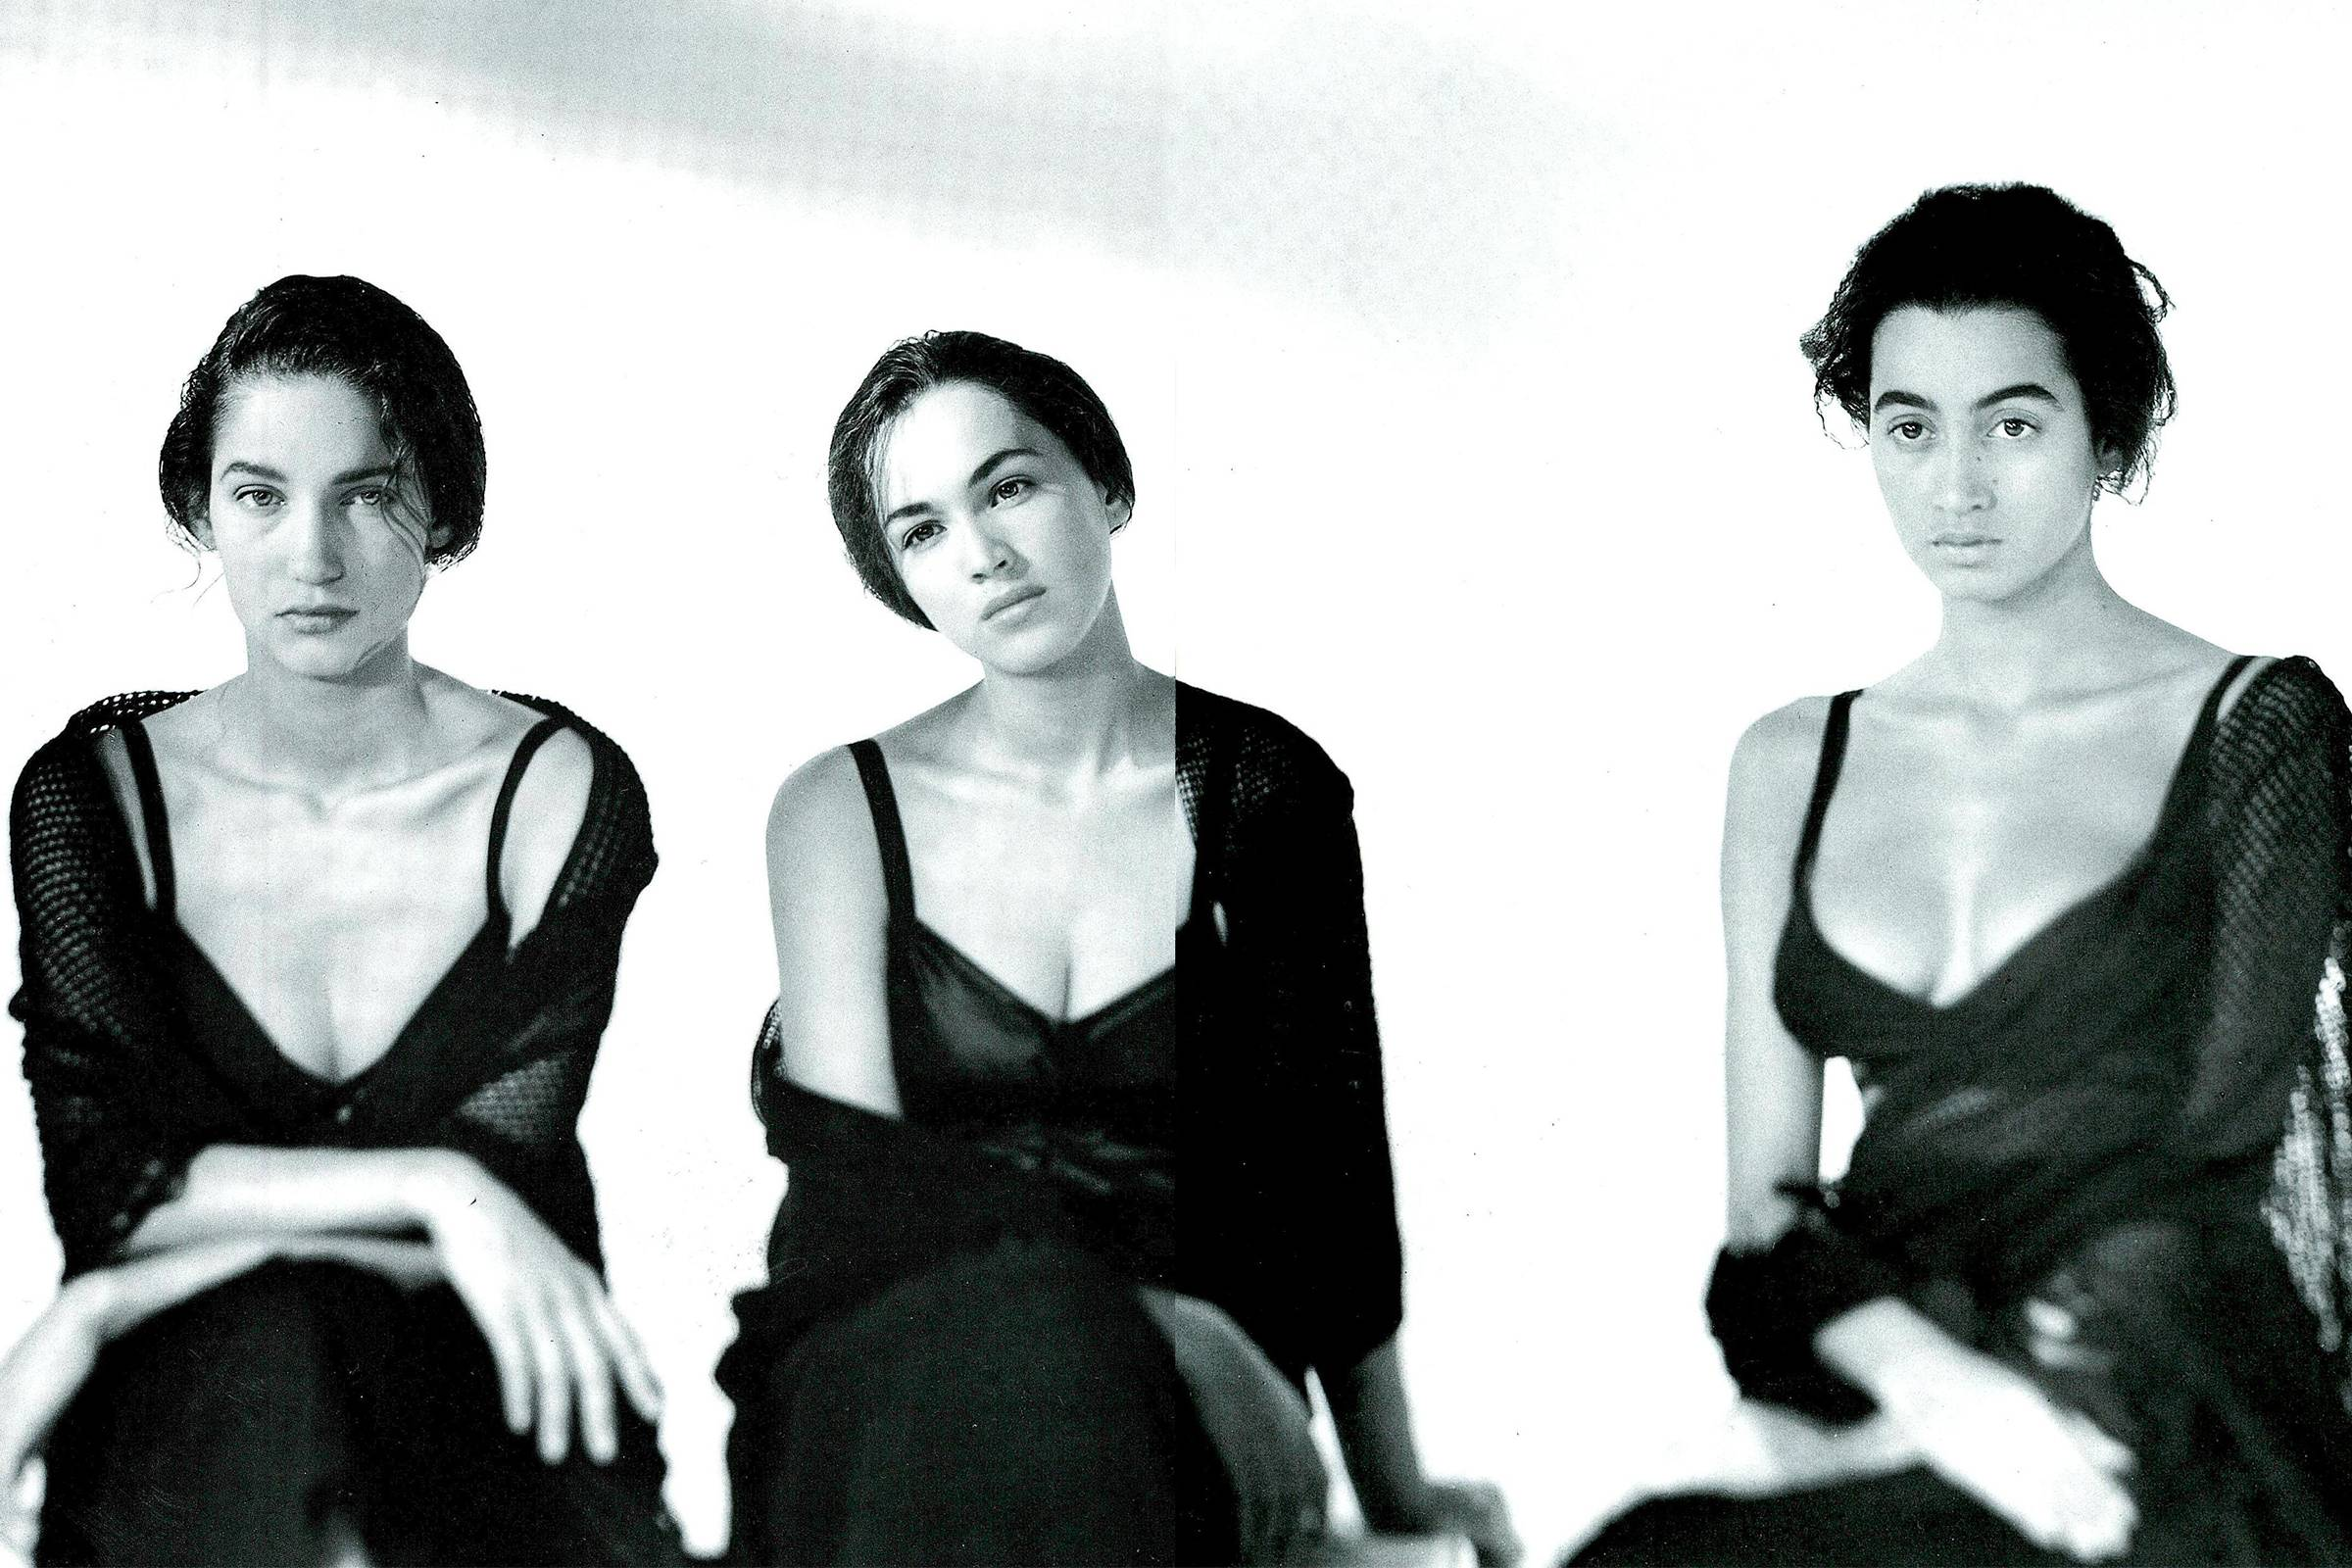 Heroine: The Sicilian Unfolding of Dolce & Gabbana